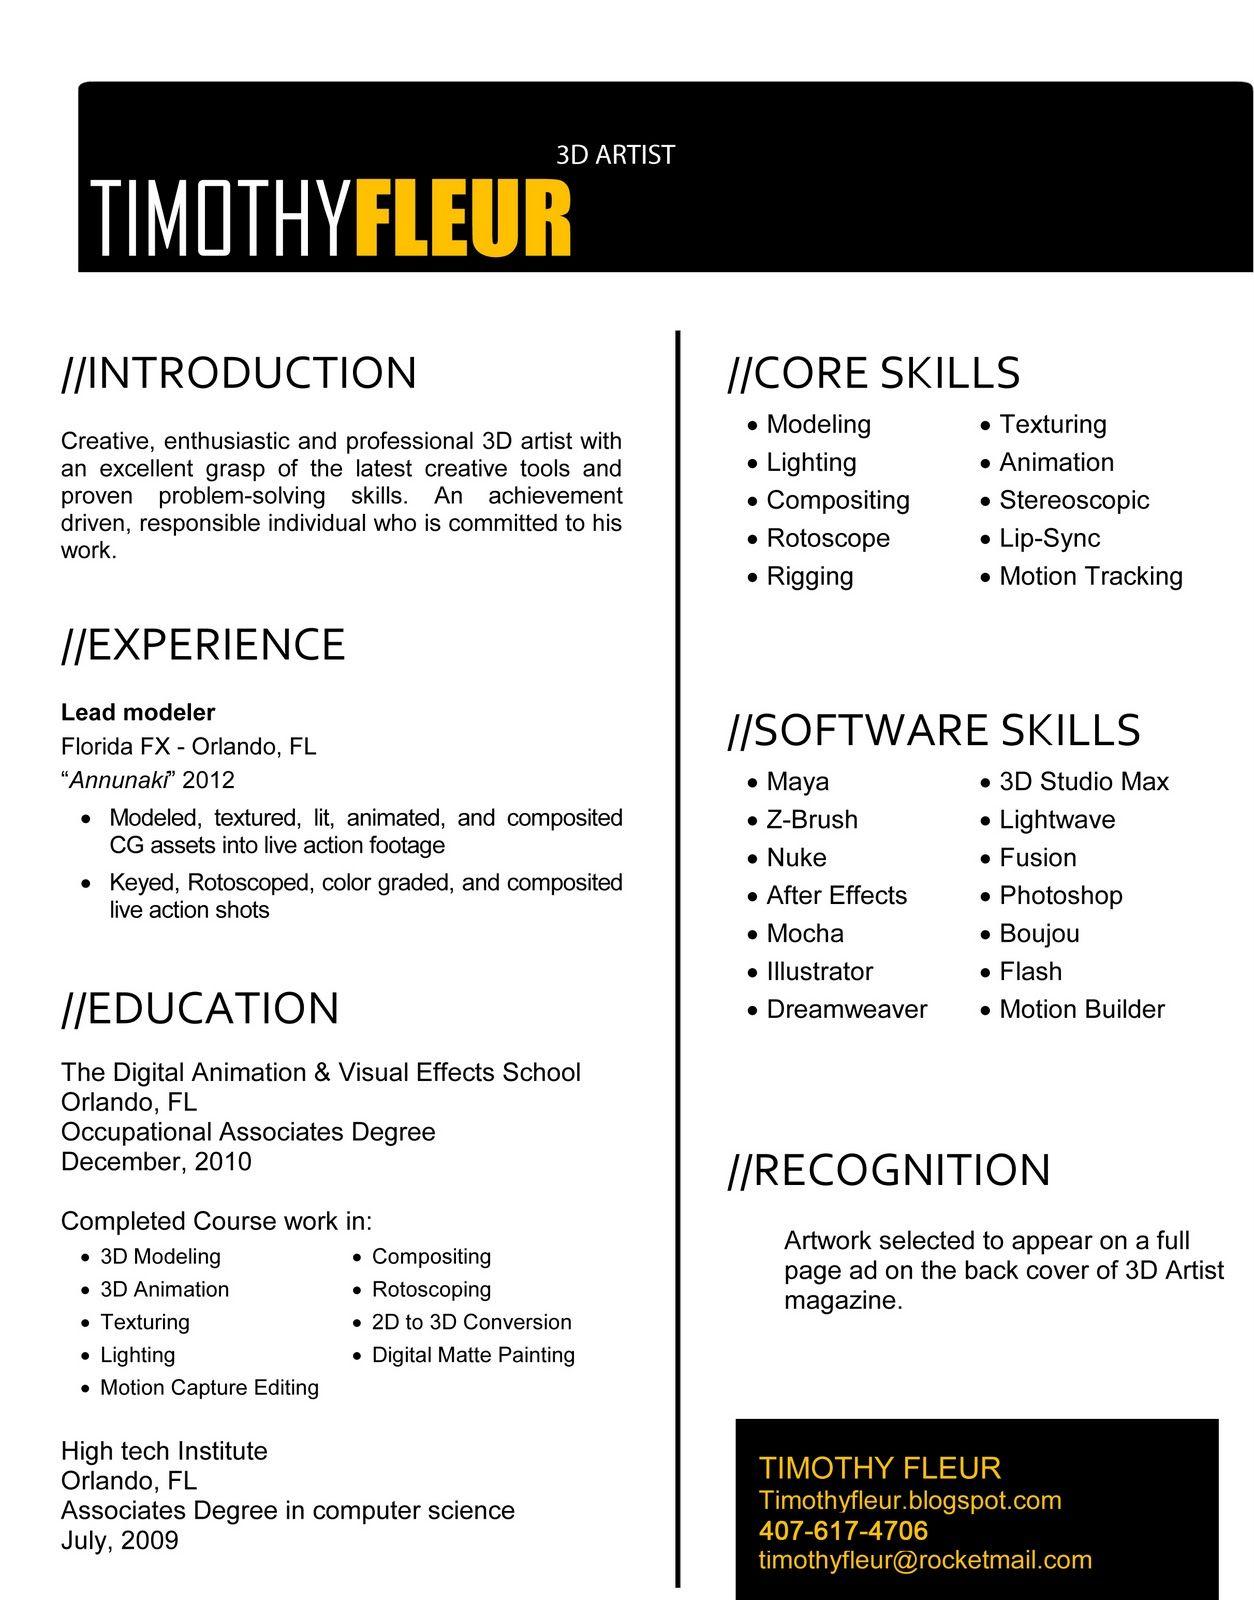 timothy fleur 3d artist   resume